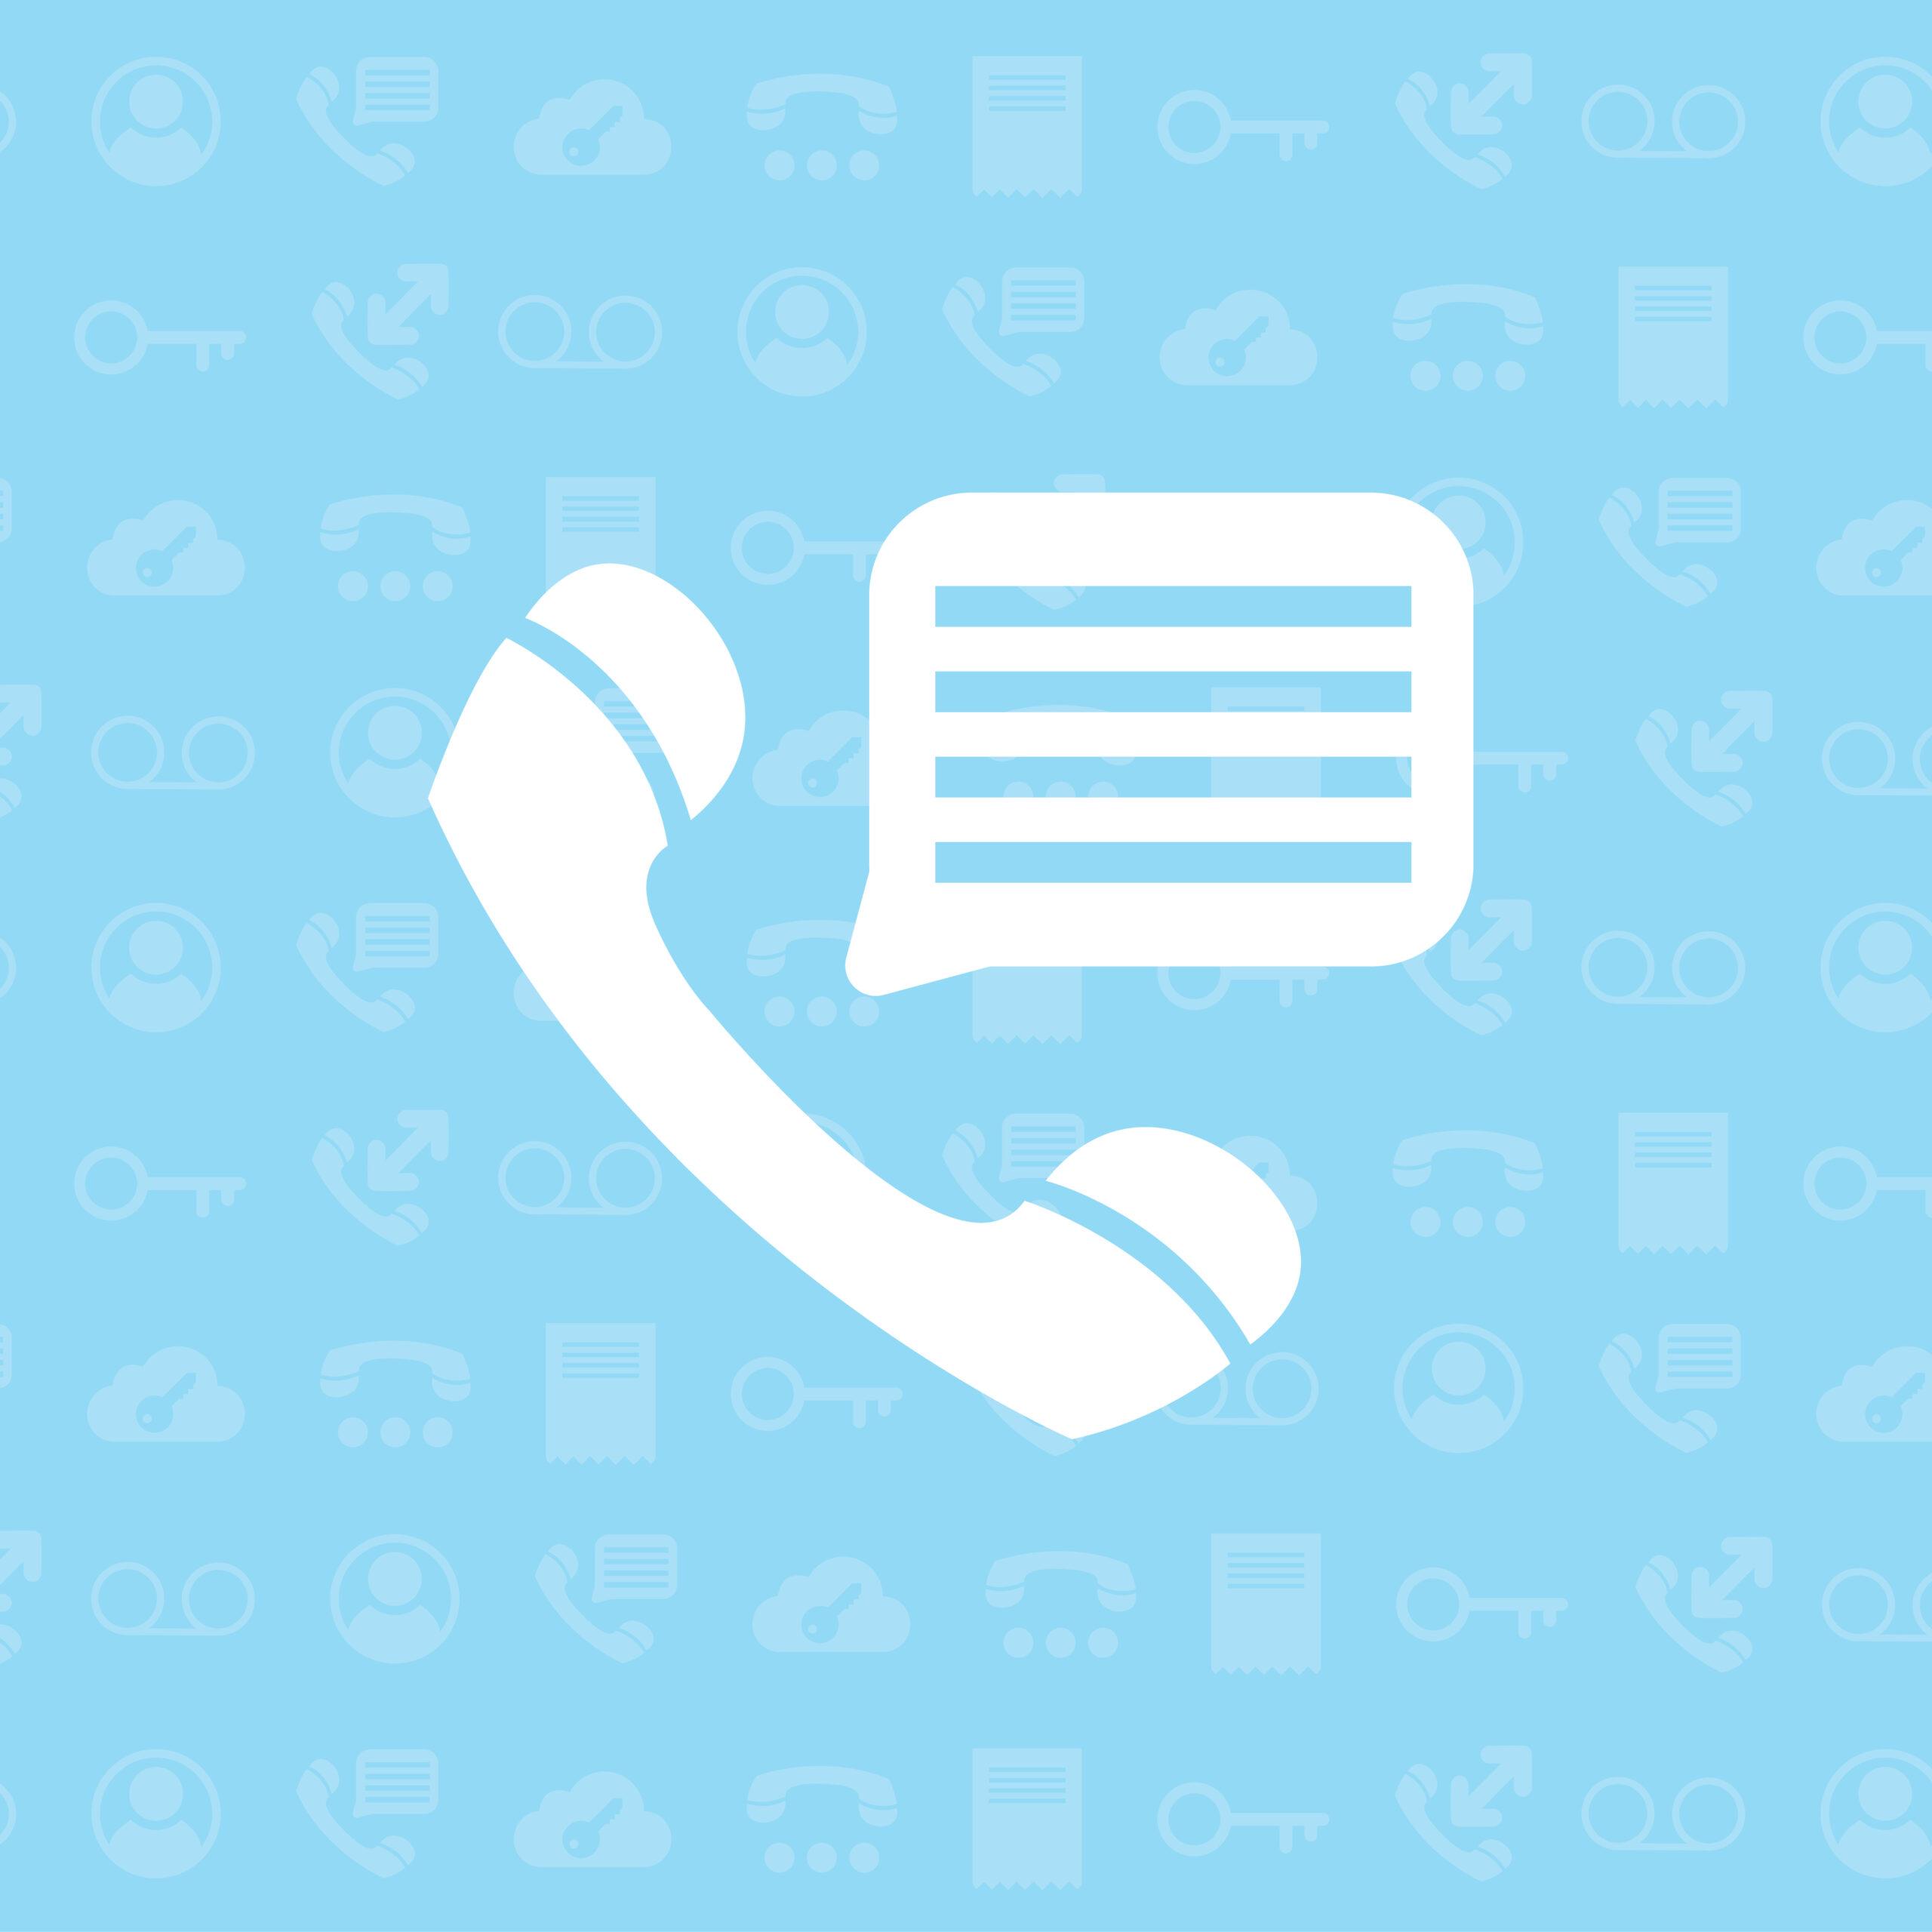 Icon illustration of phone call